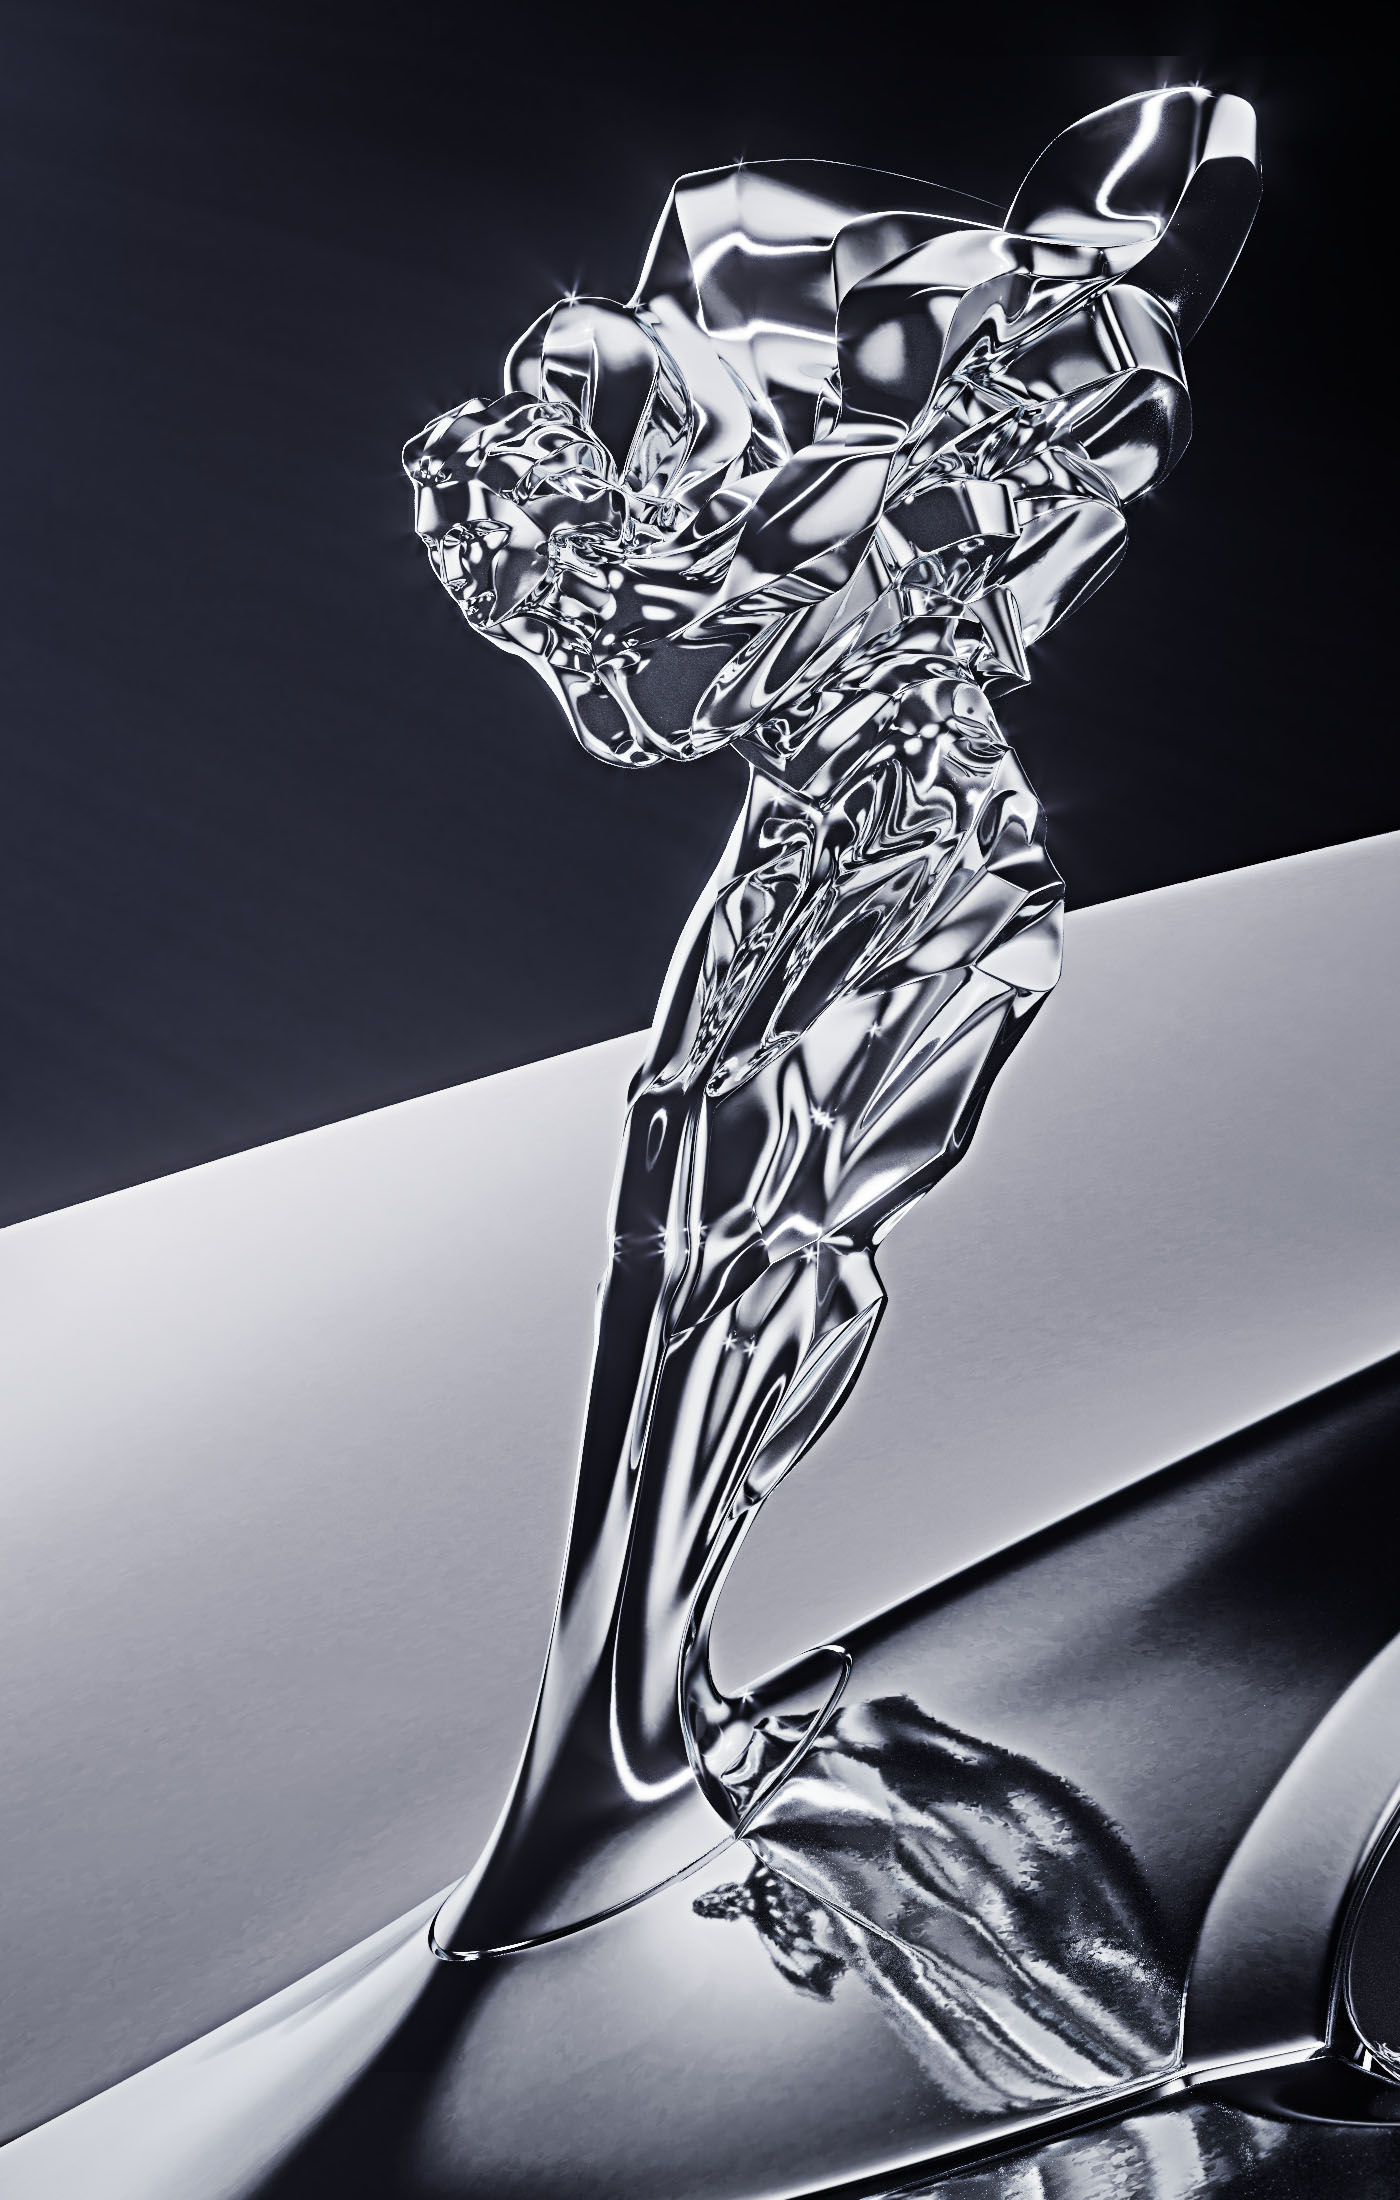 Rolls Royce luxury automotive design 13.jpg